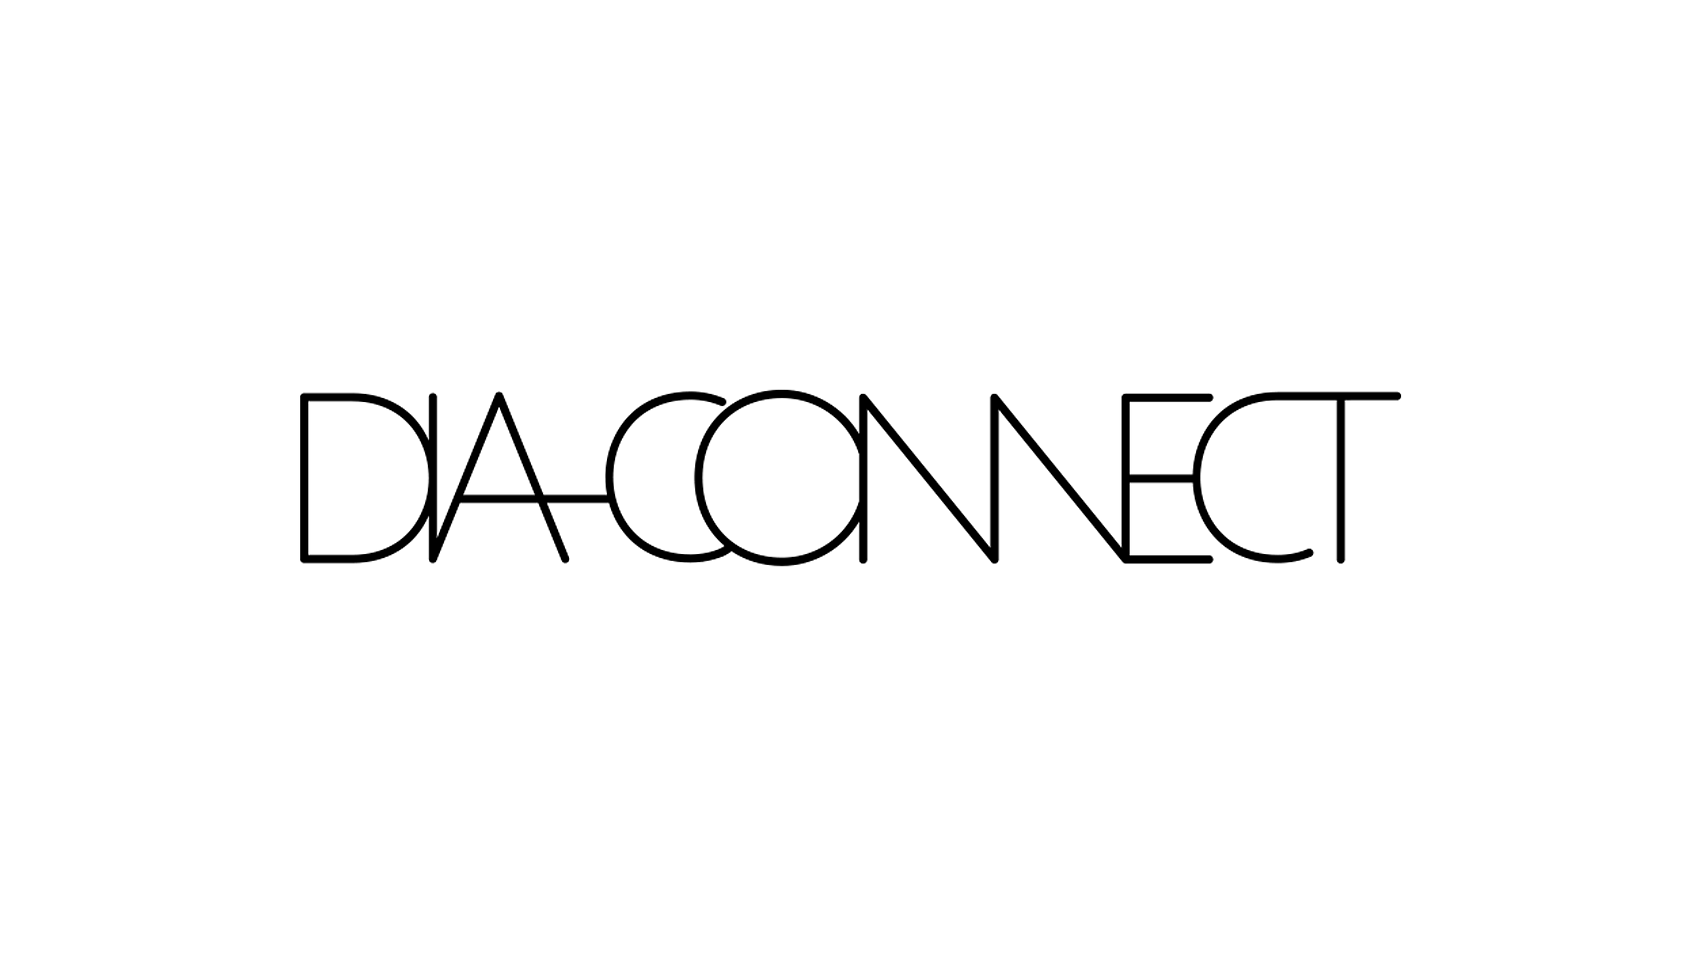 DIA CONNECTの文字のつながり